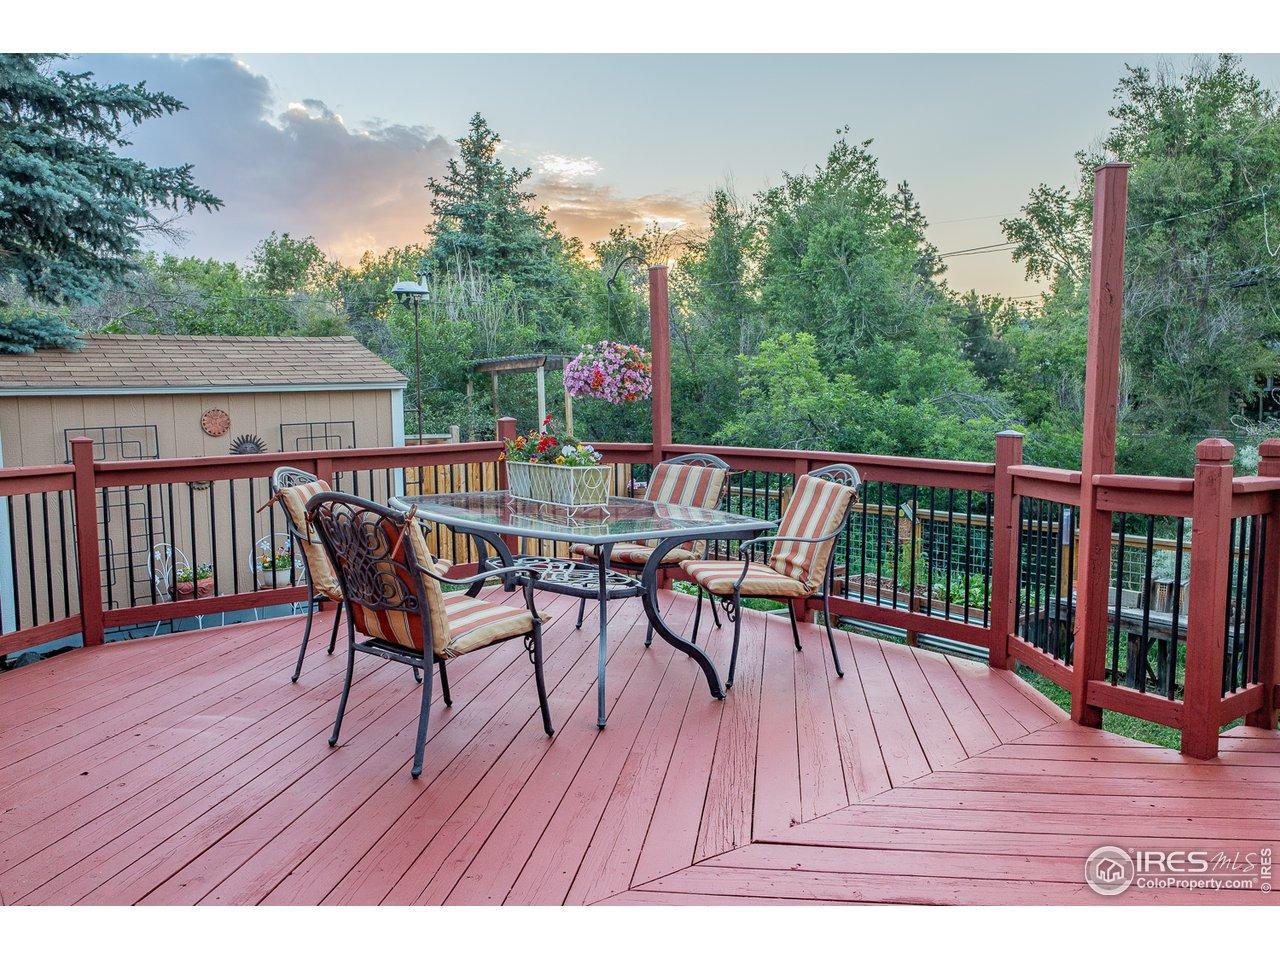 Large Deck in Backyard